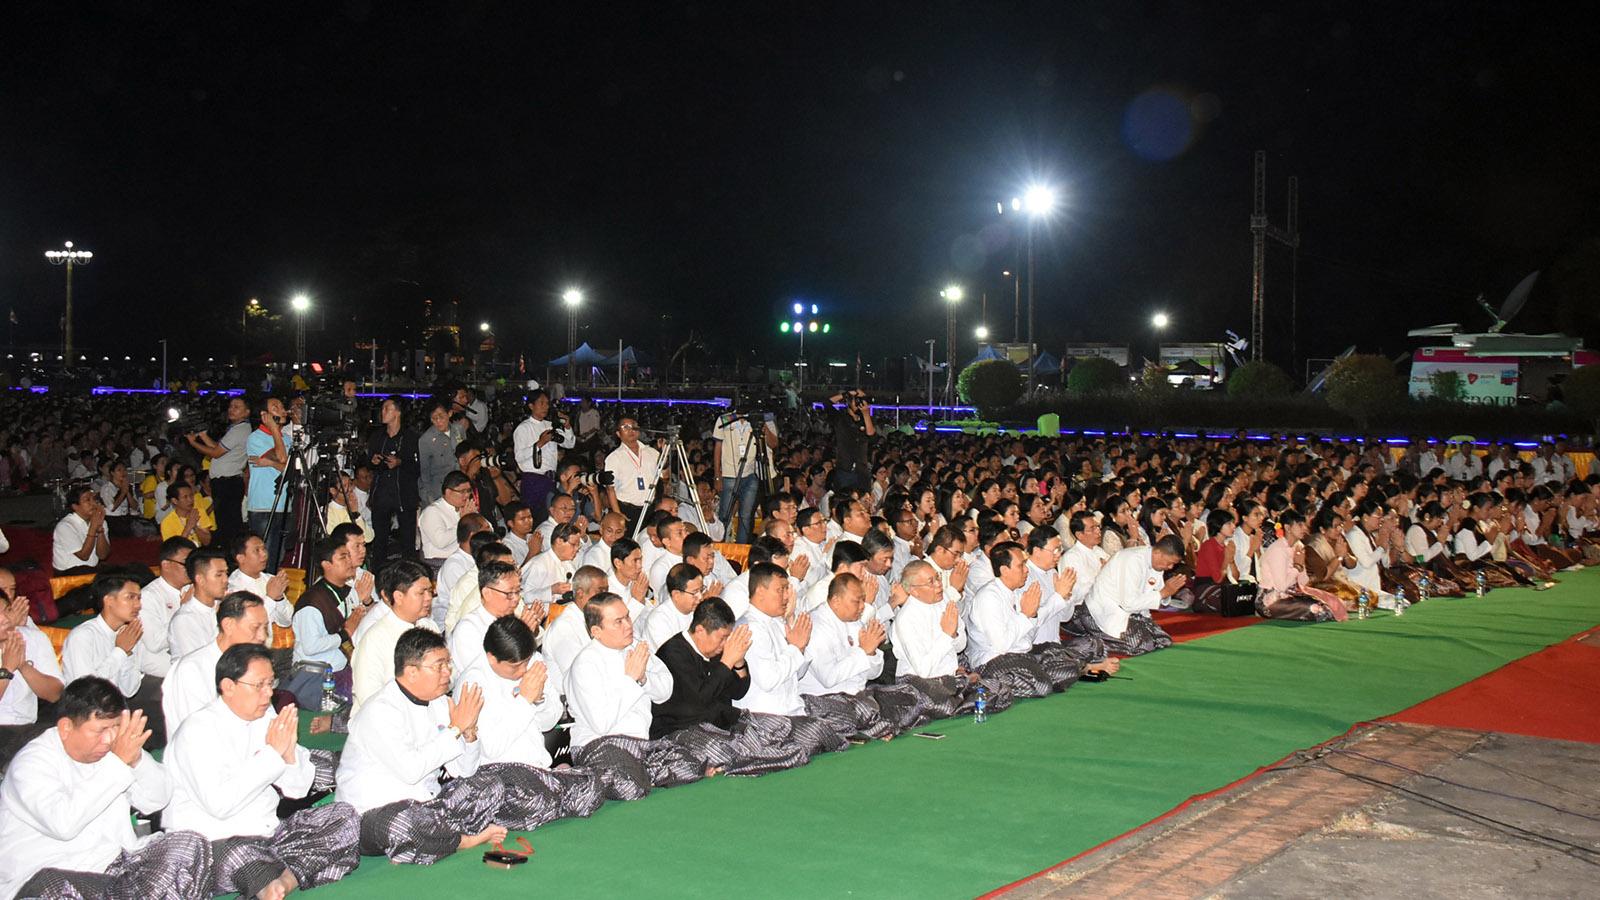 Bhamo Sayadaw Dr. Bhaddanta Kumara Bhivamsa delivers a sermon to Buddhist devotees at the New Year Dhamma Ceremony in Yangon.Photo: Zaw Min Latt